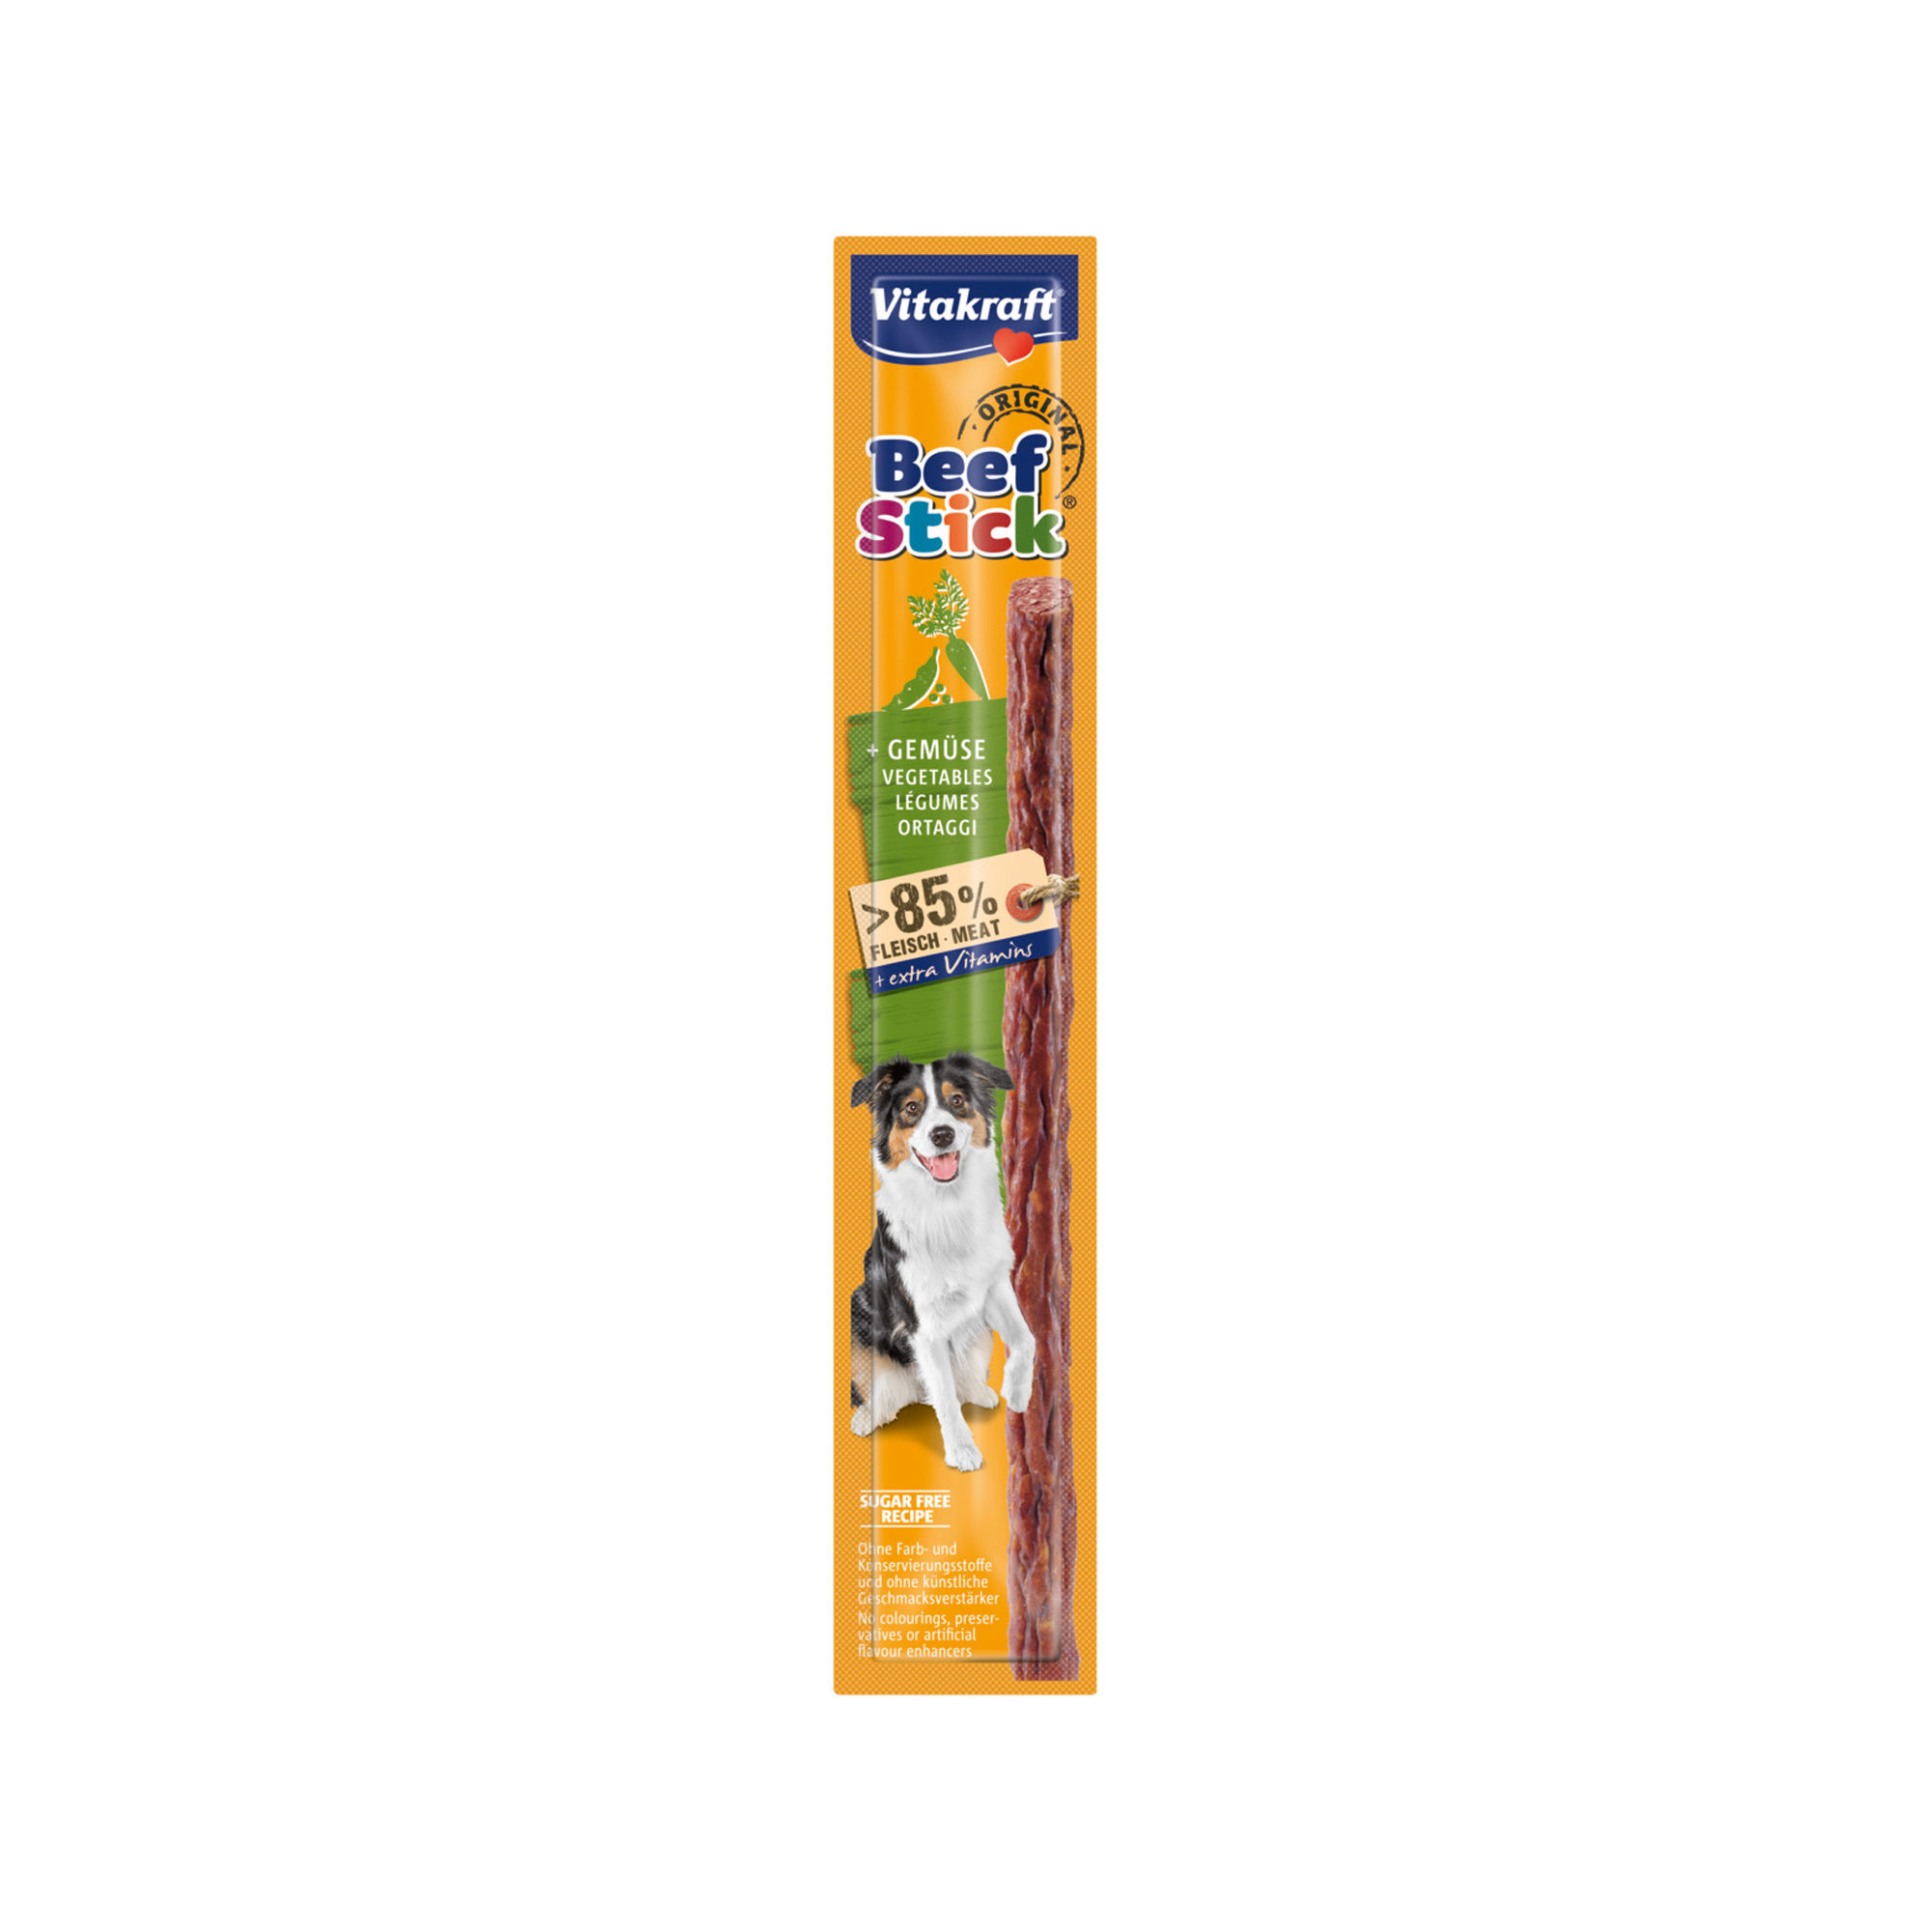 Vitakraft Beef Stick - Original Gemüse